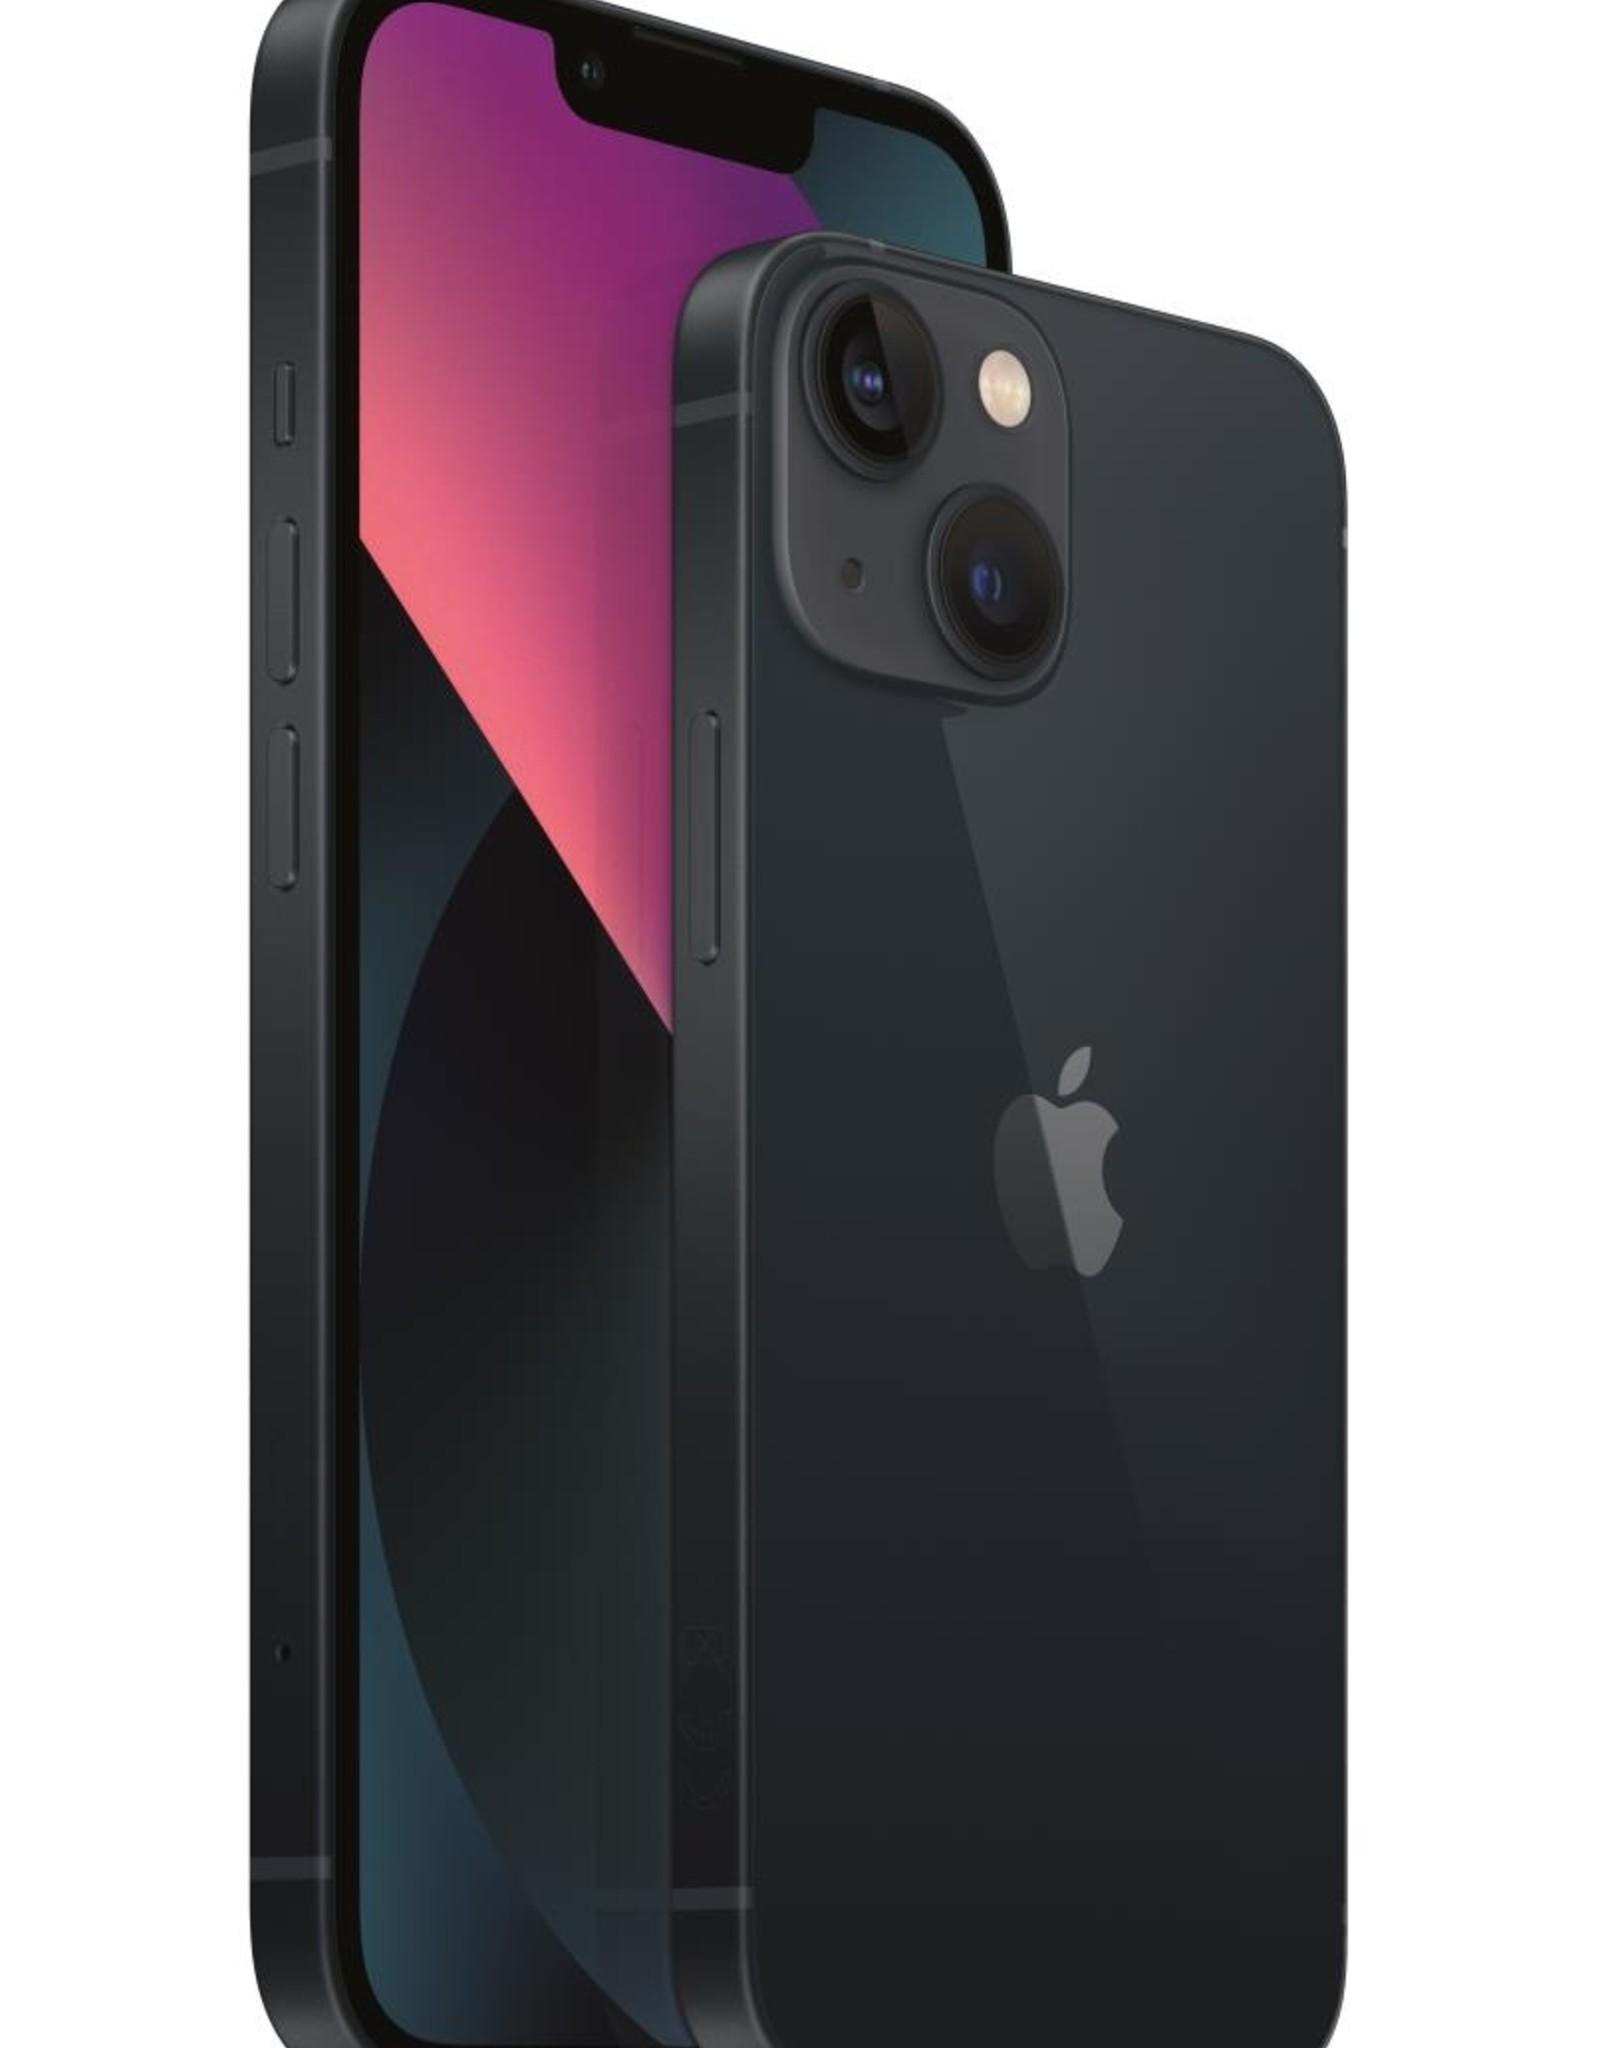 Apple iPhone 13 mini 128GB Middernacht